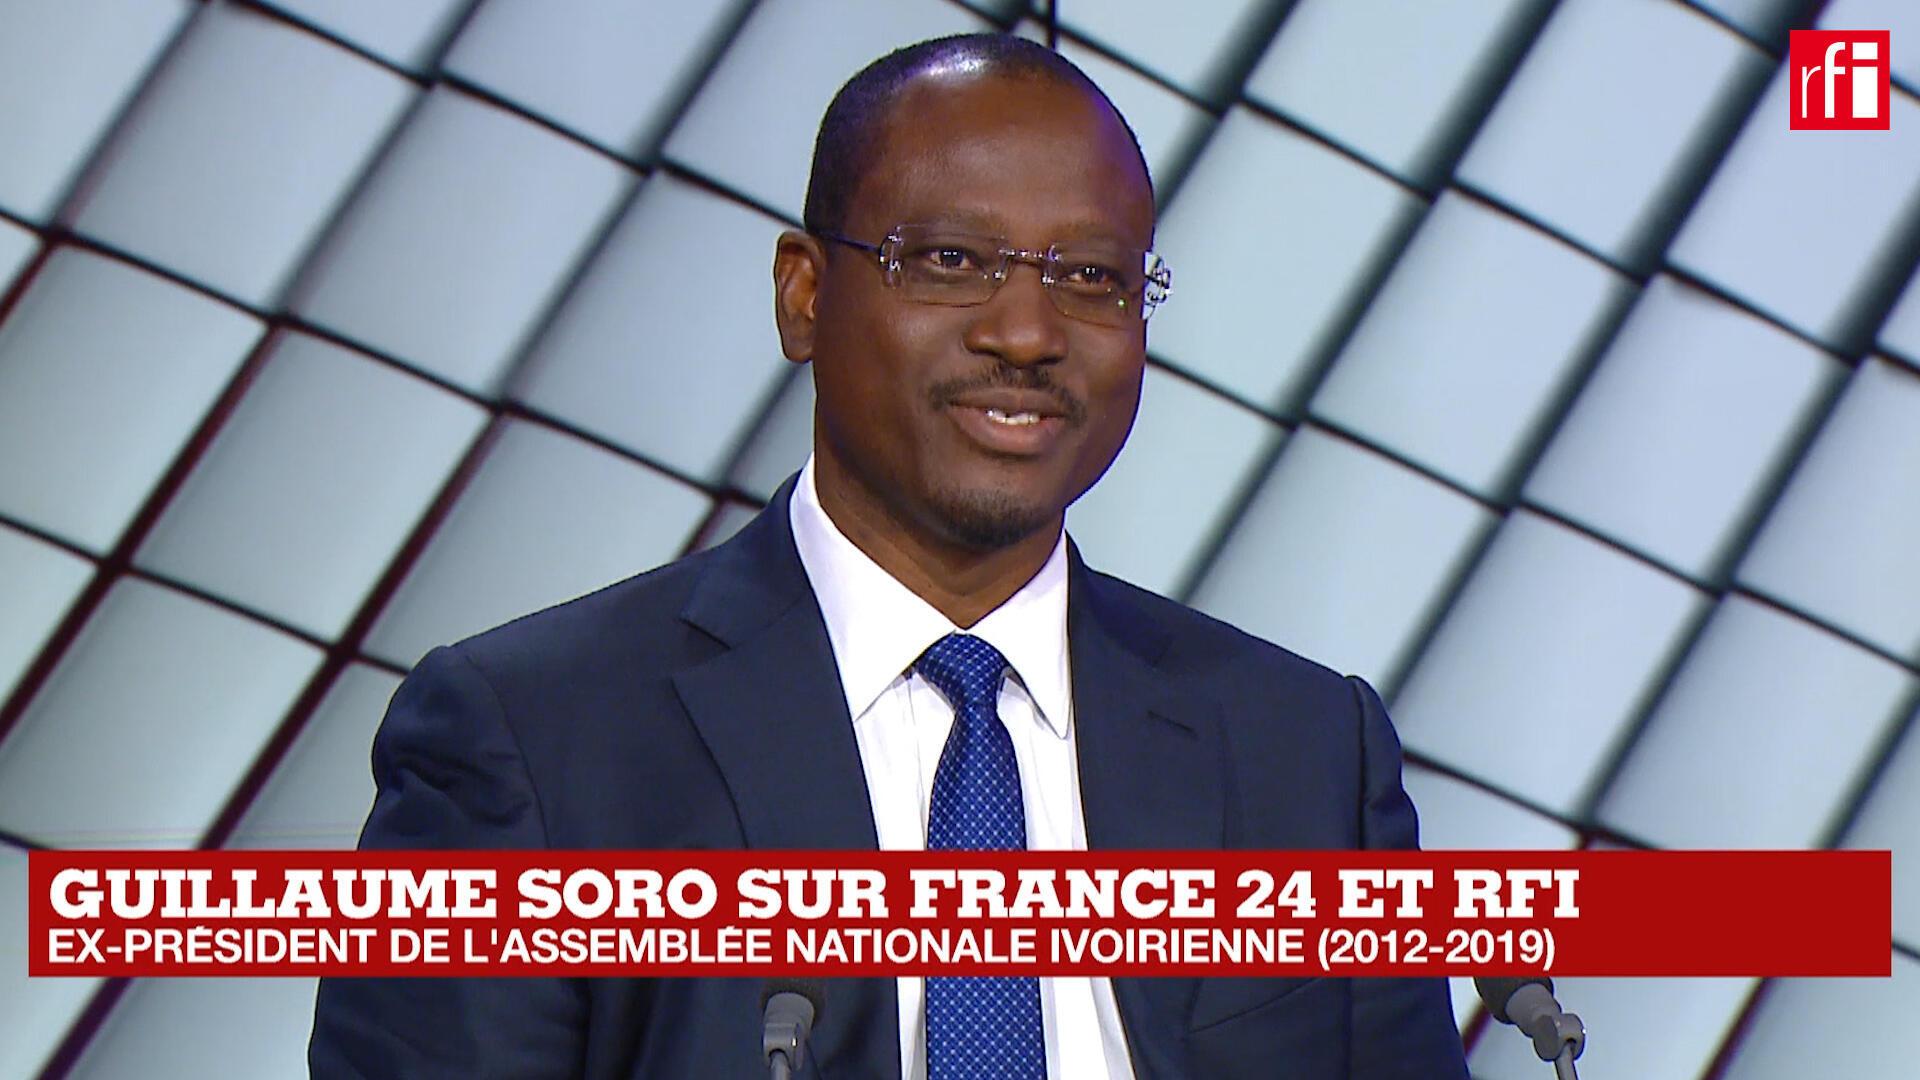 Guillaume Soro, tsohon shugaban majalisar dokokin kasar cote d'Ivoire.